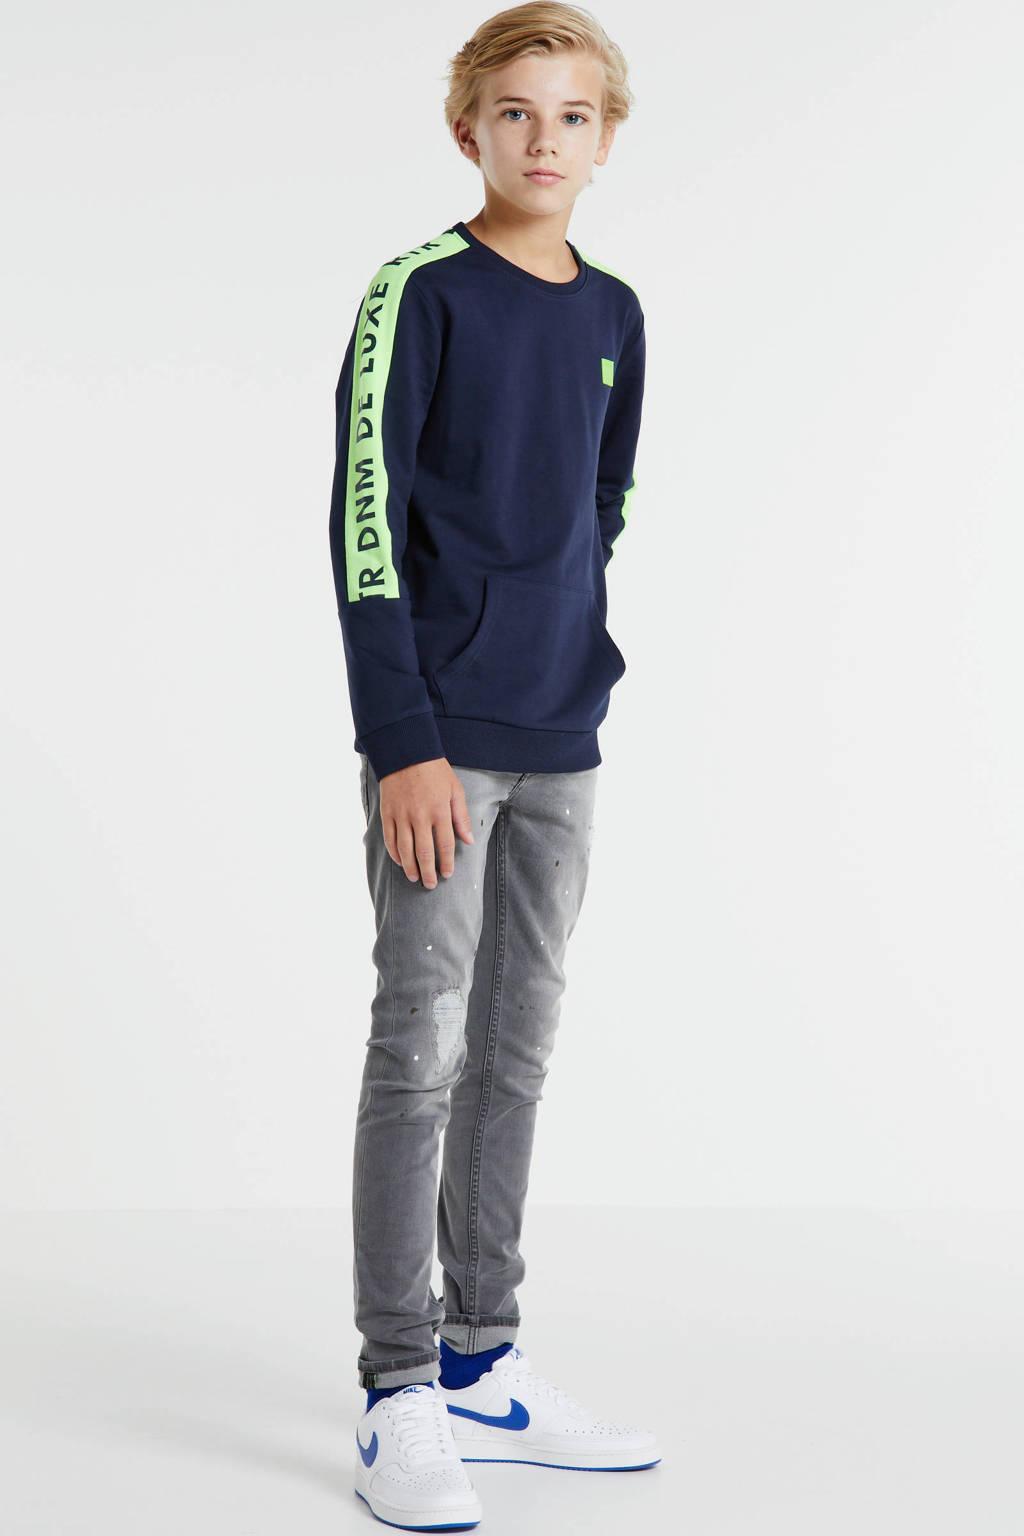 Retour Denim sweater Fredo met logo donkerblauw/neongeel, Donkerblauw/neongeel